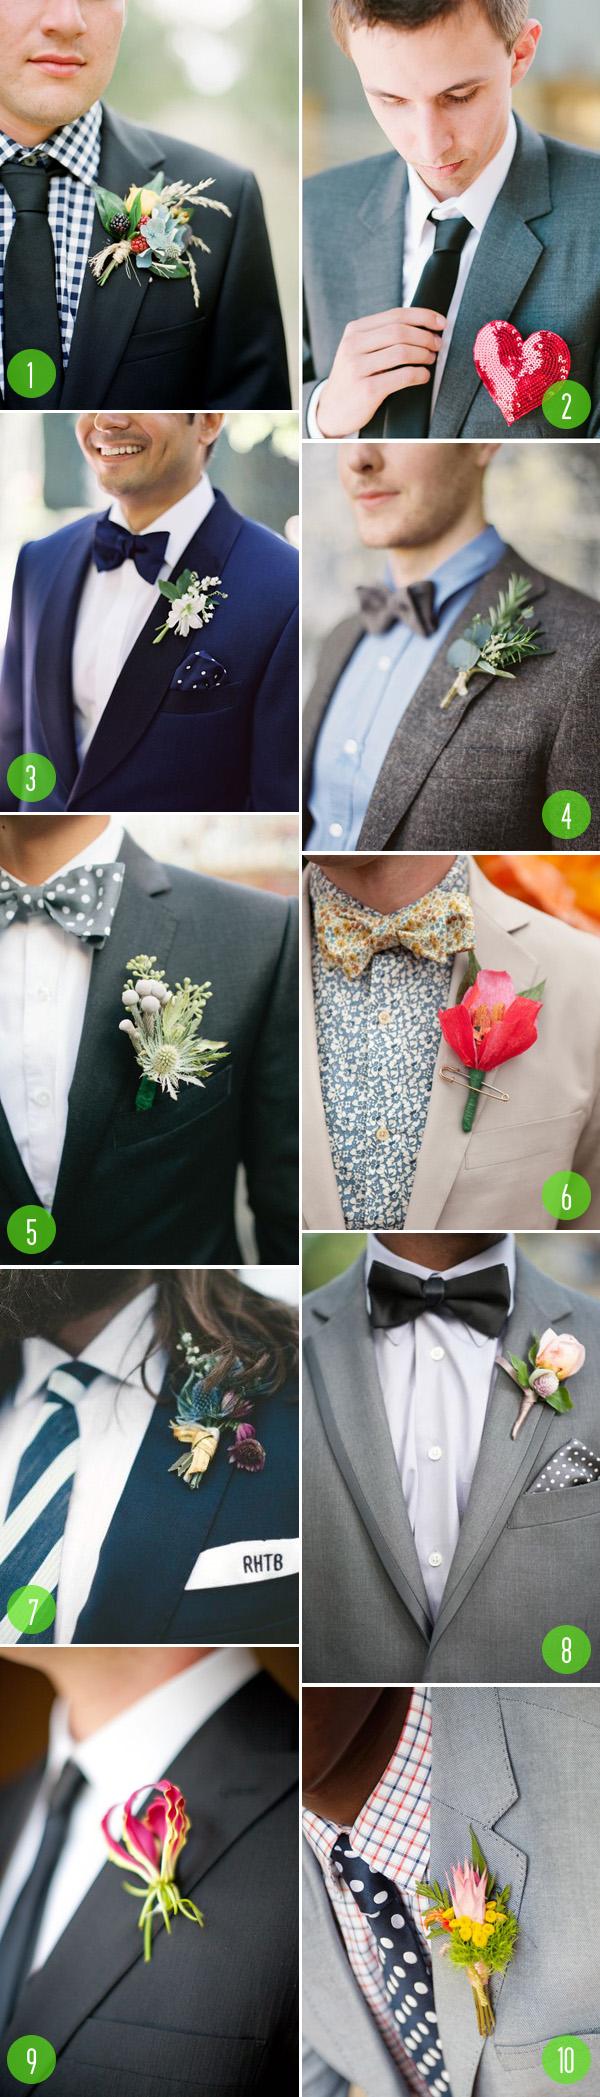 top 10: stylish grooms